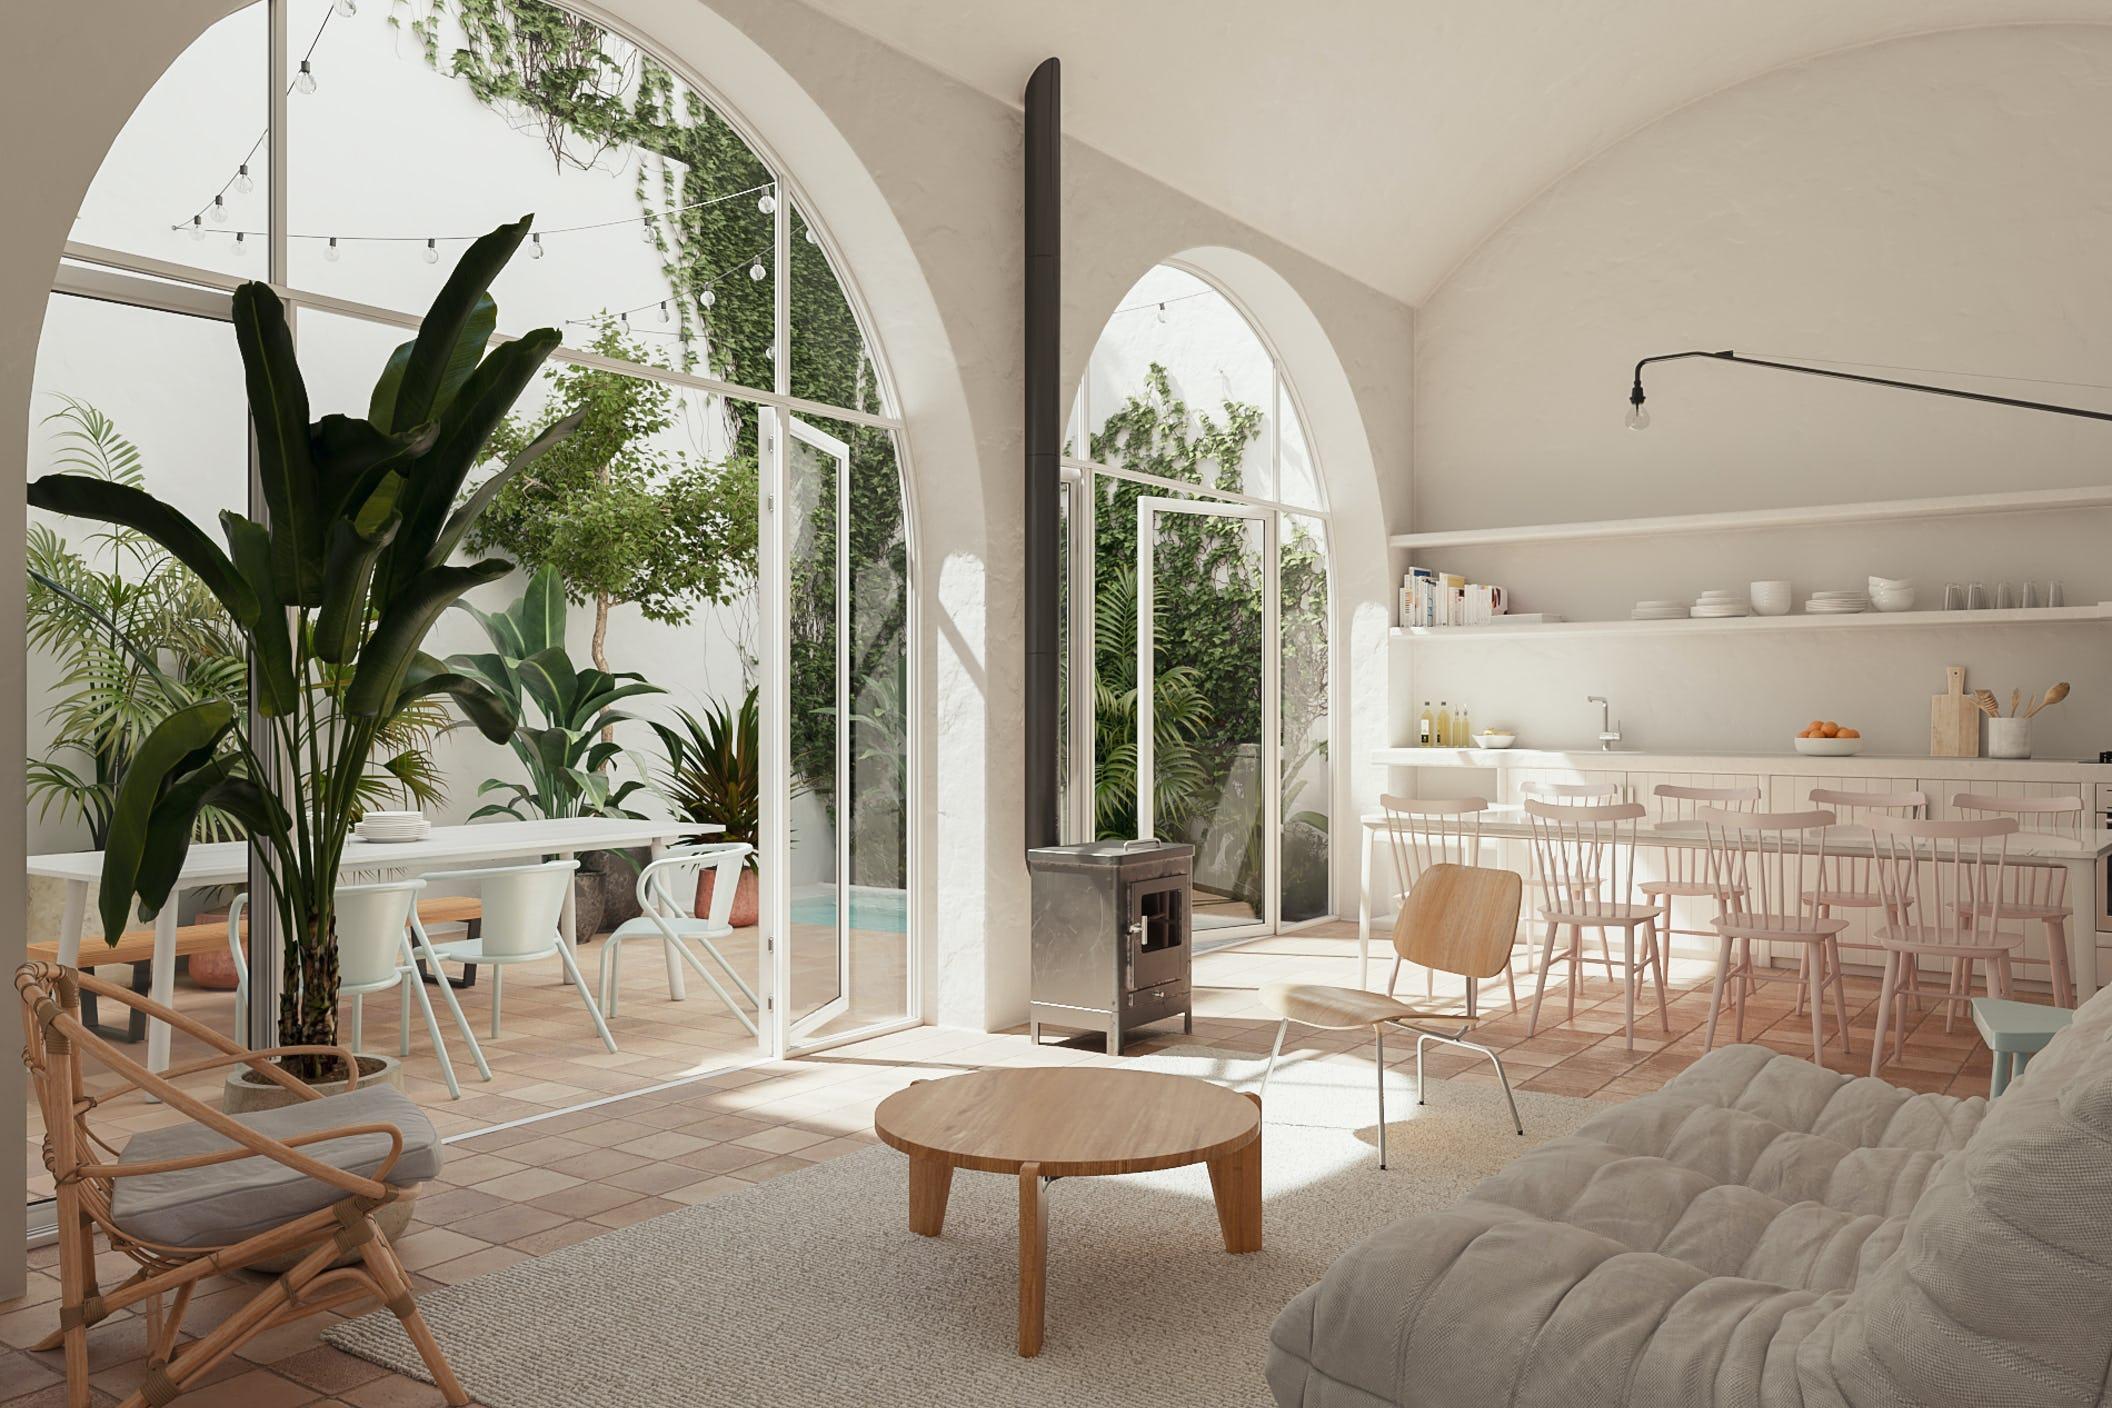 theAddresses– Unique Portuguese Holiday Homes